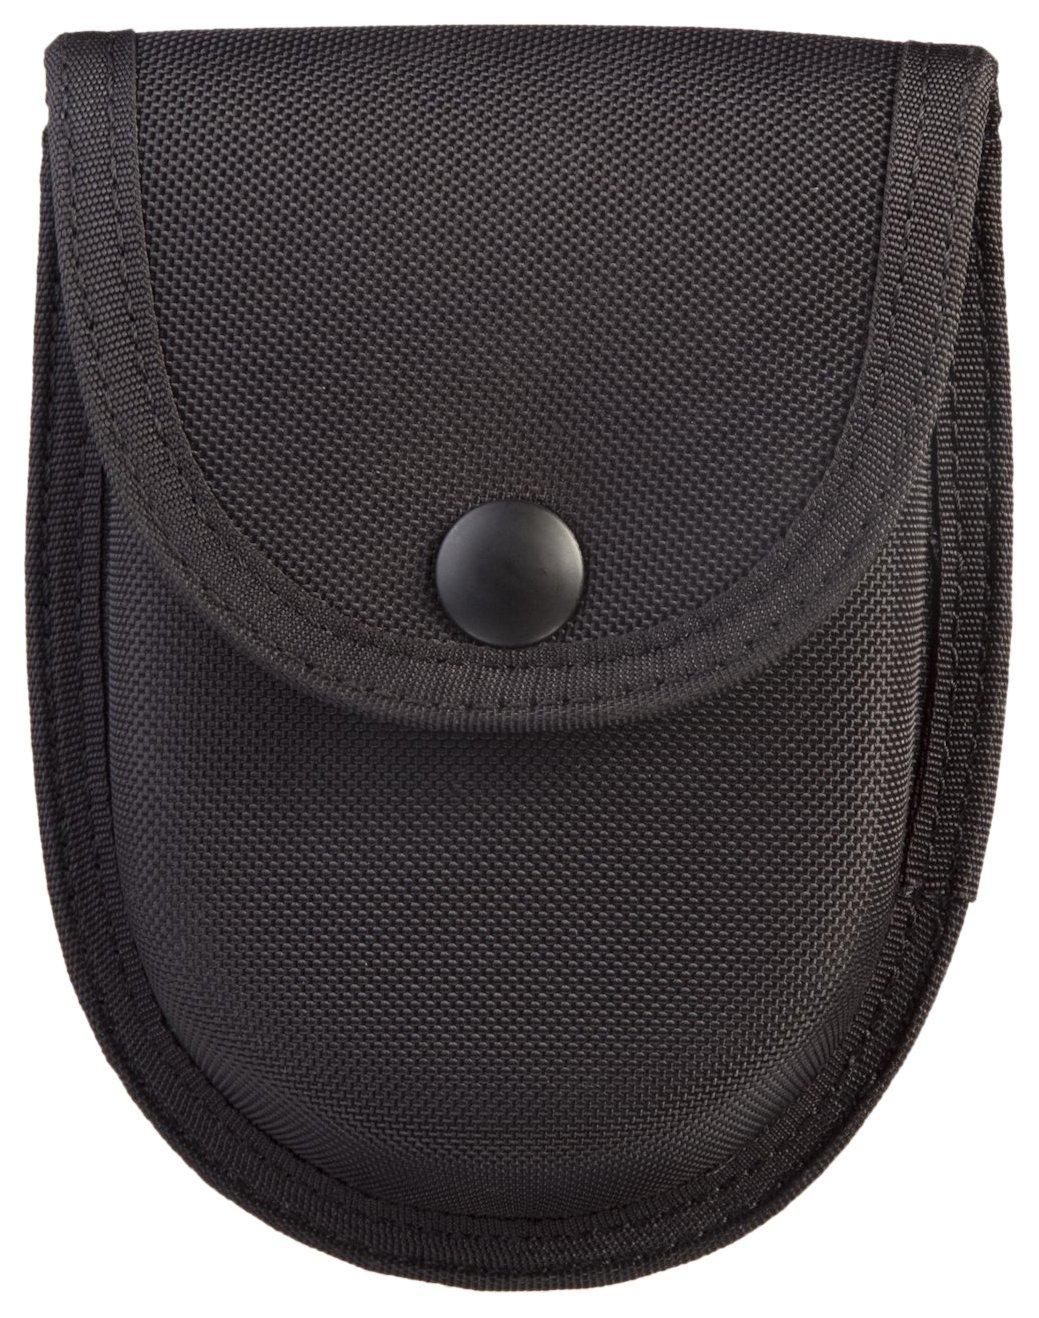 Uncle Mike's Sentinel Molded Nylon Single Handcuff Case, Black